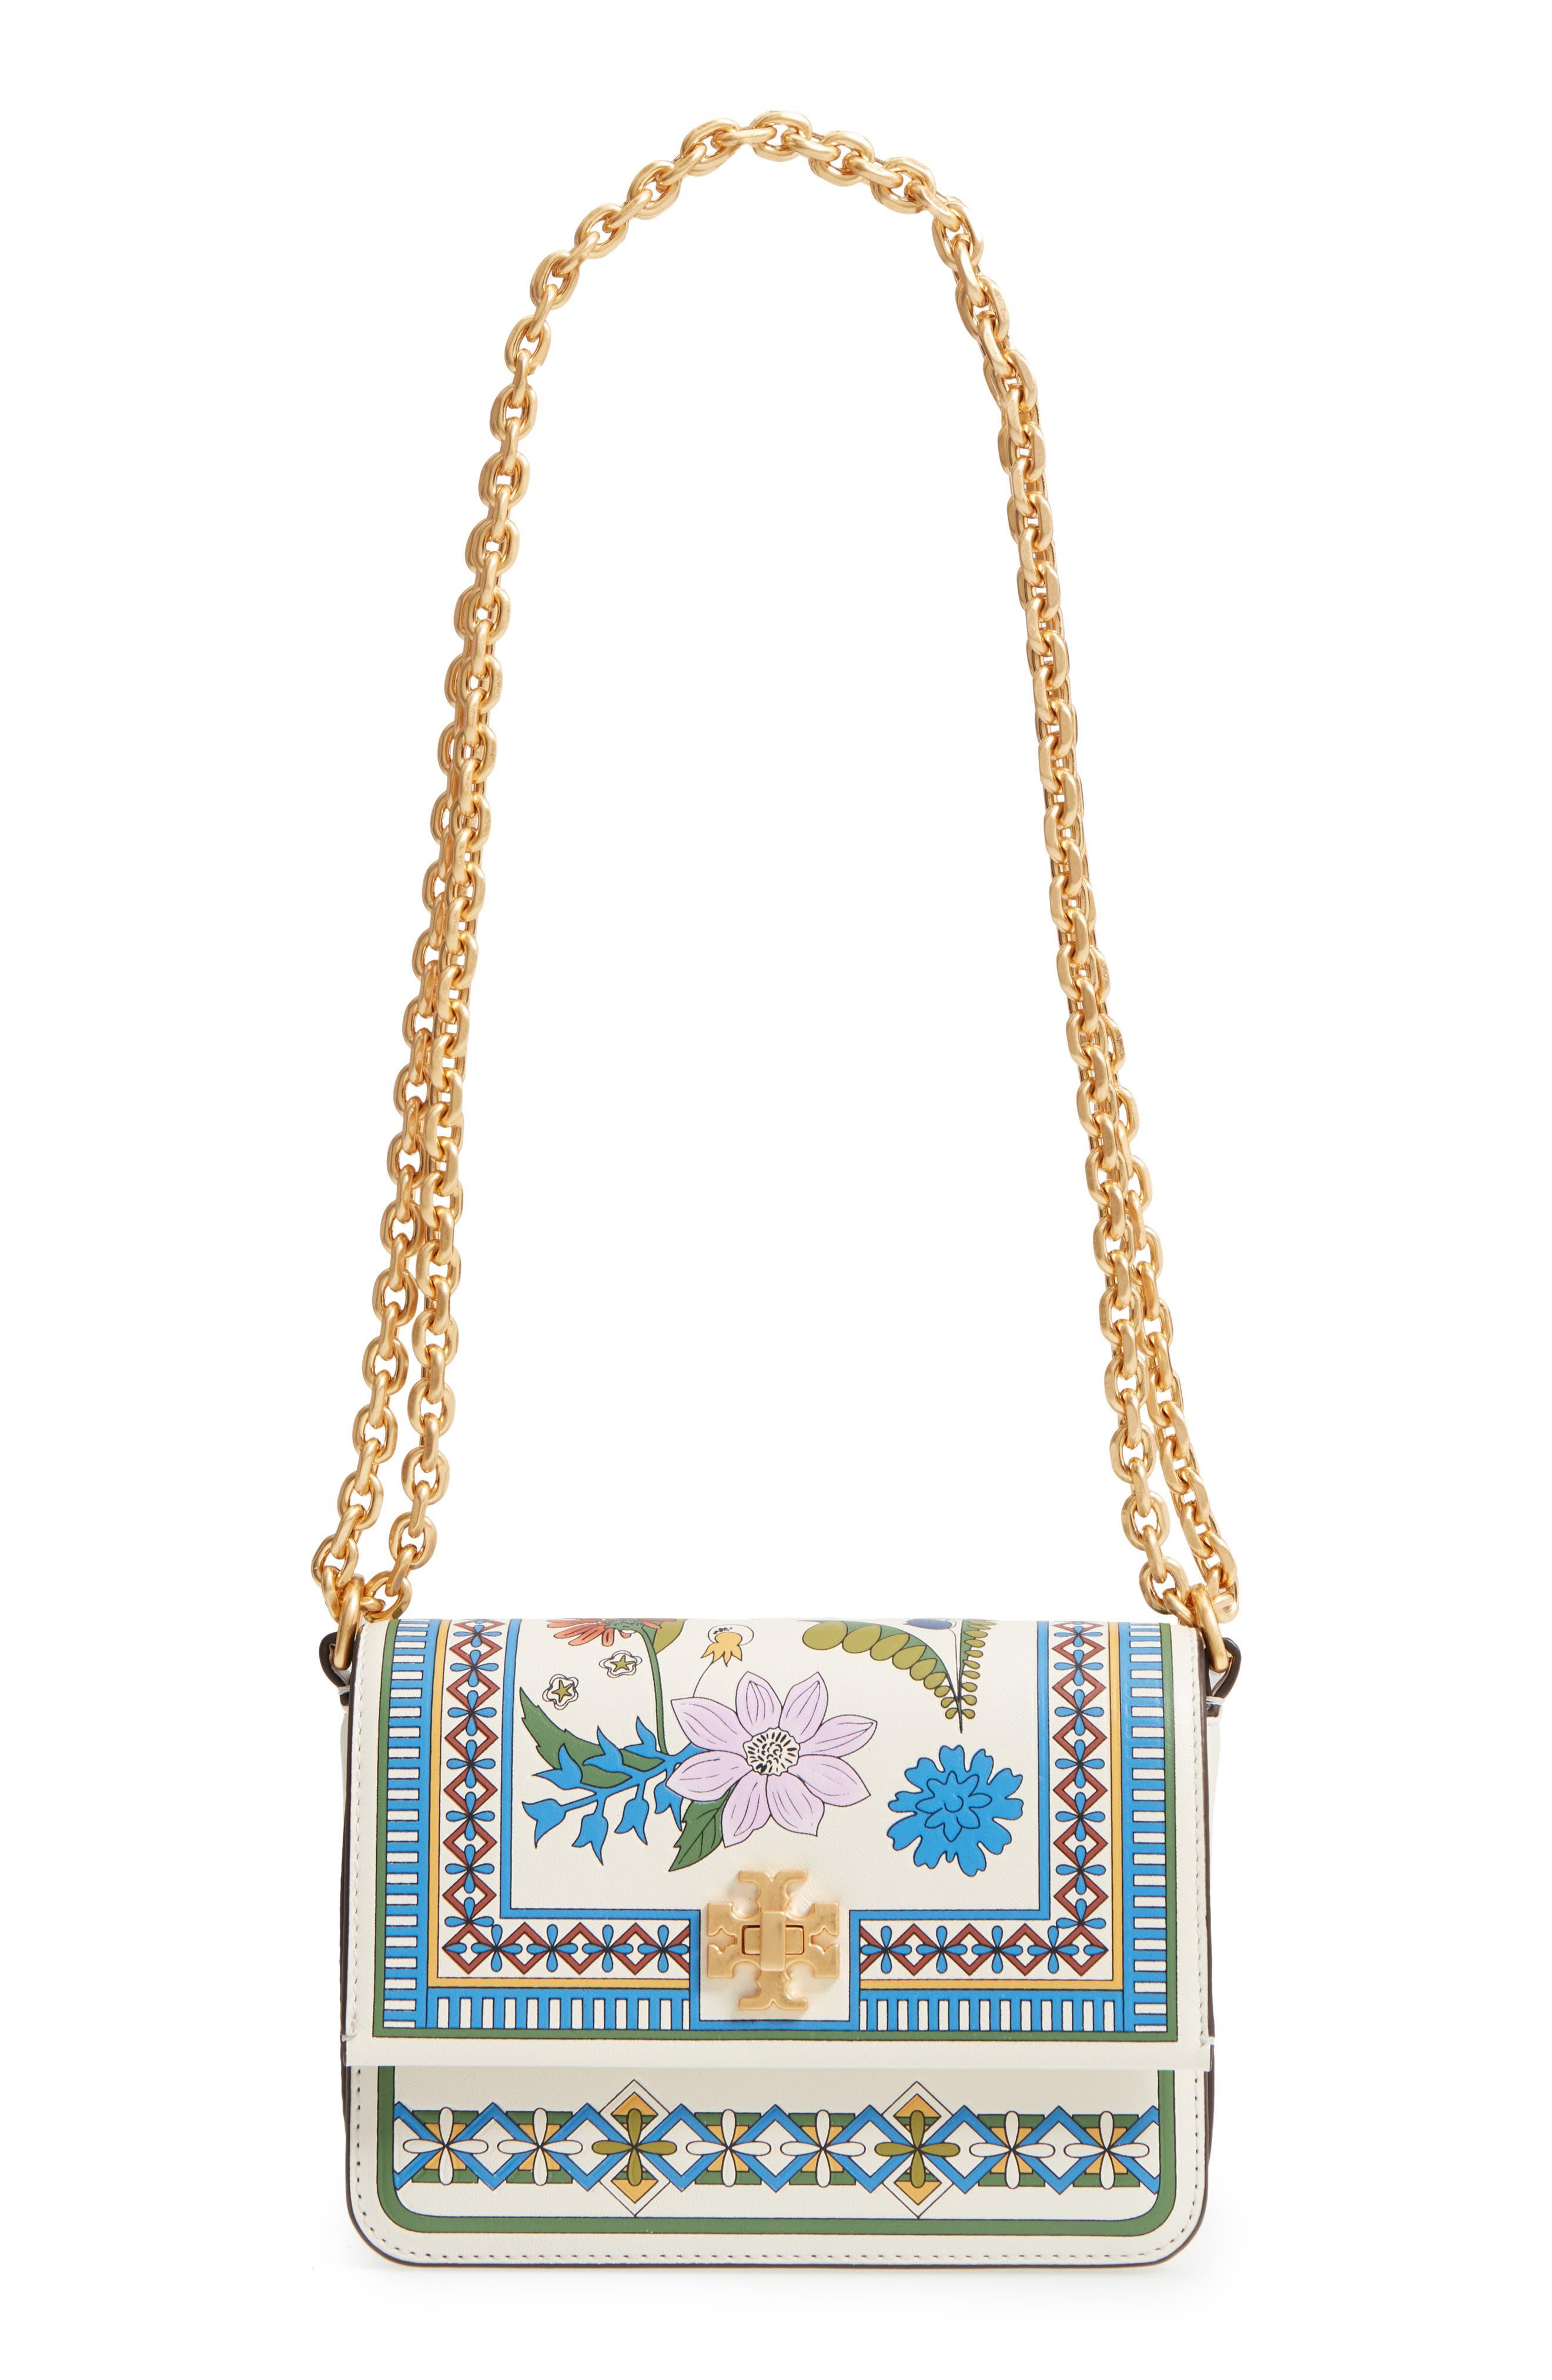 Mini Kira Floral Print Leather Bag,                             Main thumbnail 1, color,                             IVORY MEADOW SWEET